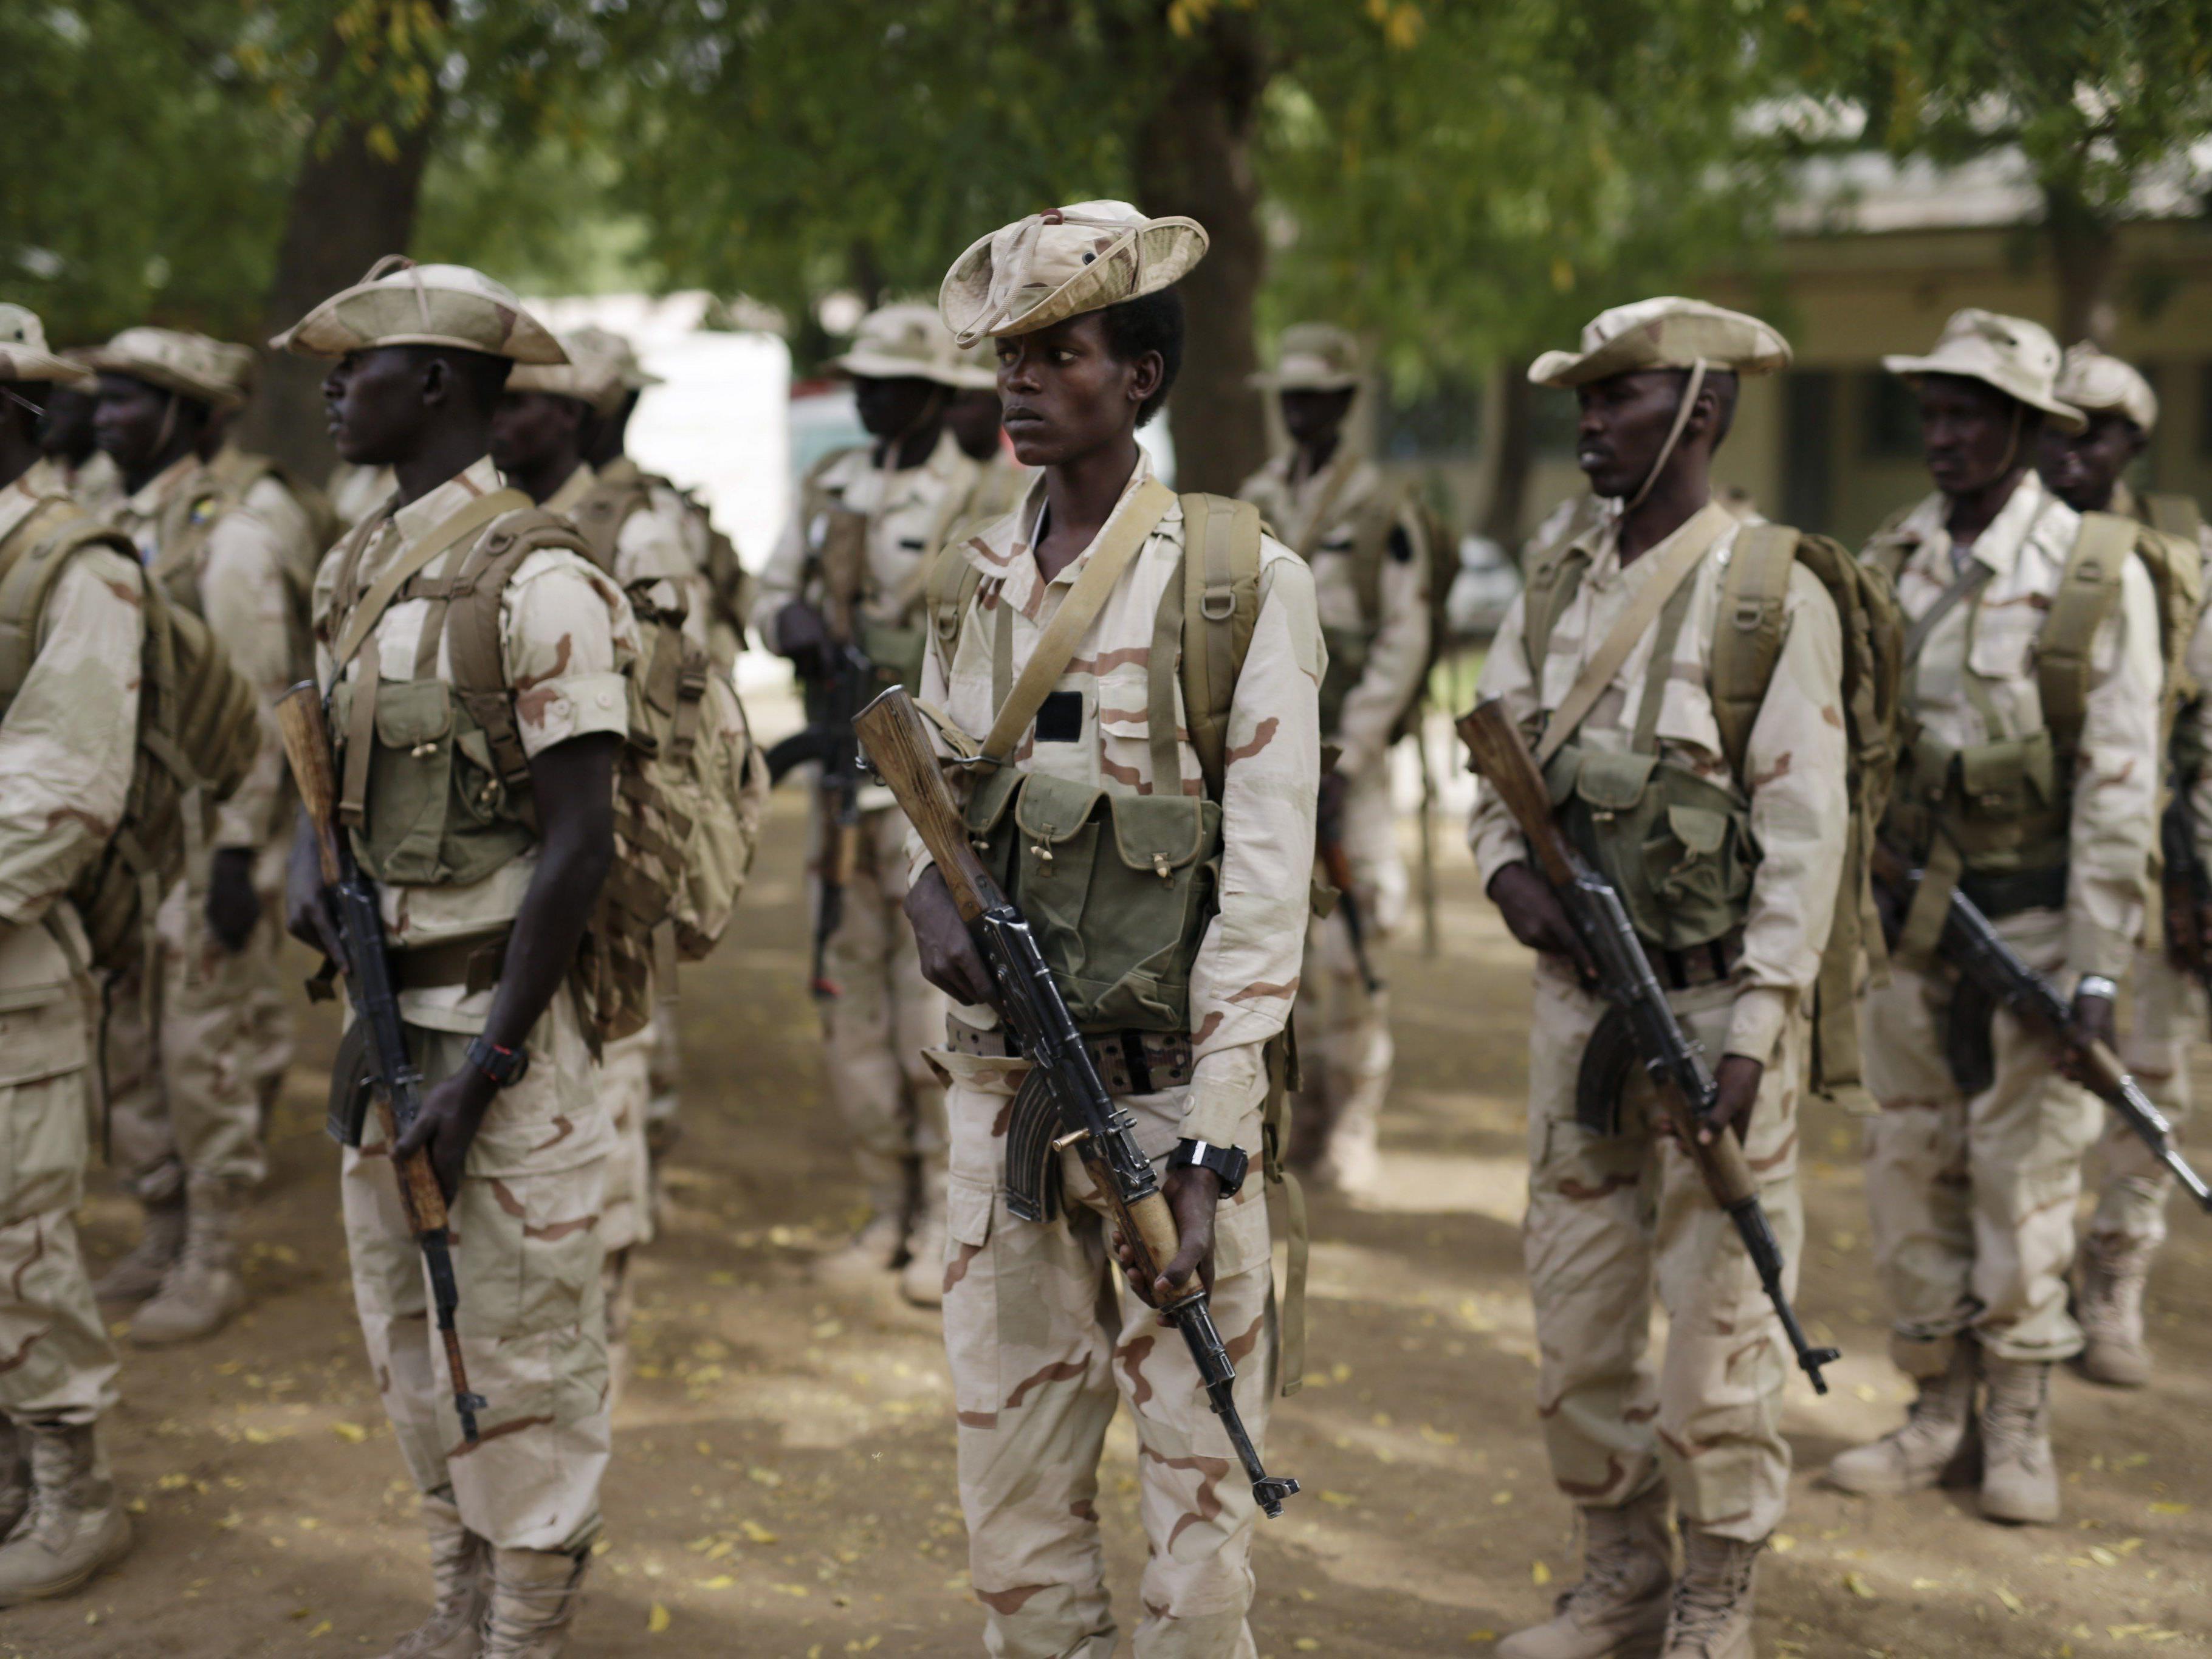 AI kritisiert das Militär Nigerias scharf.